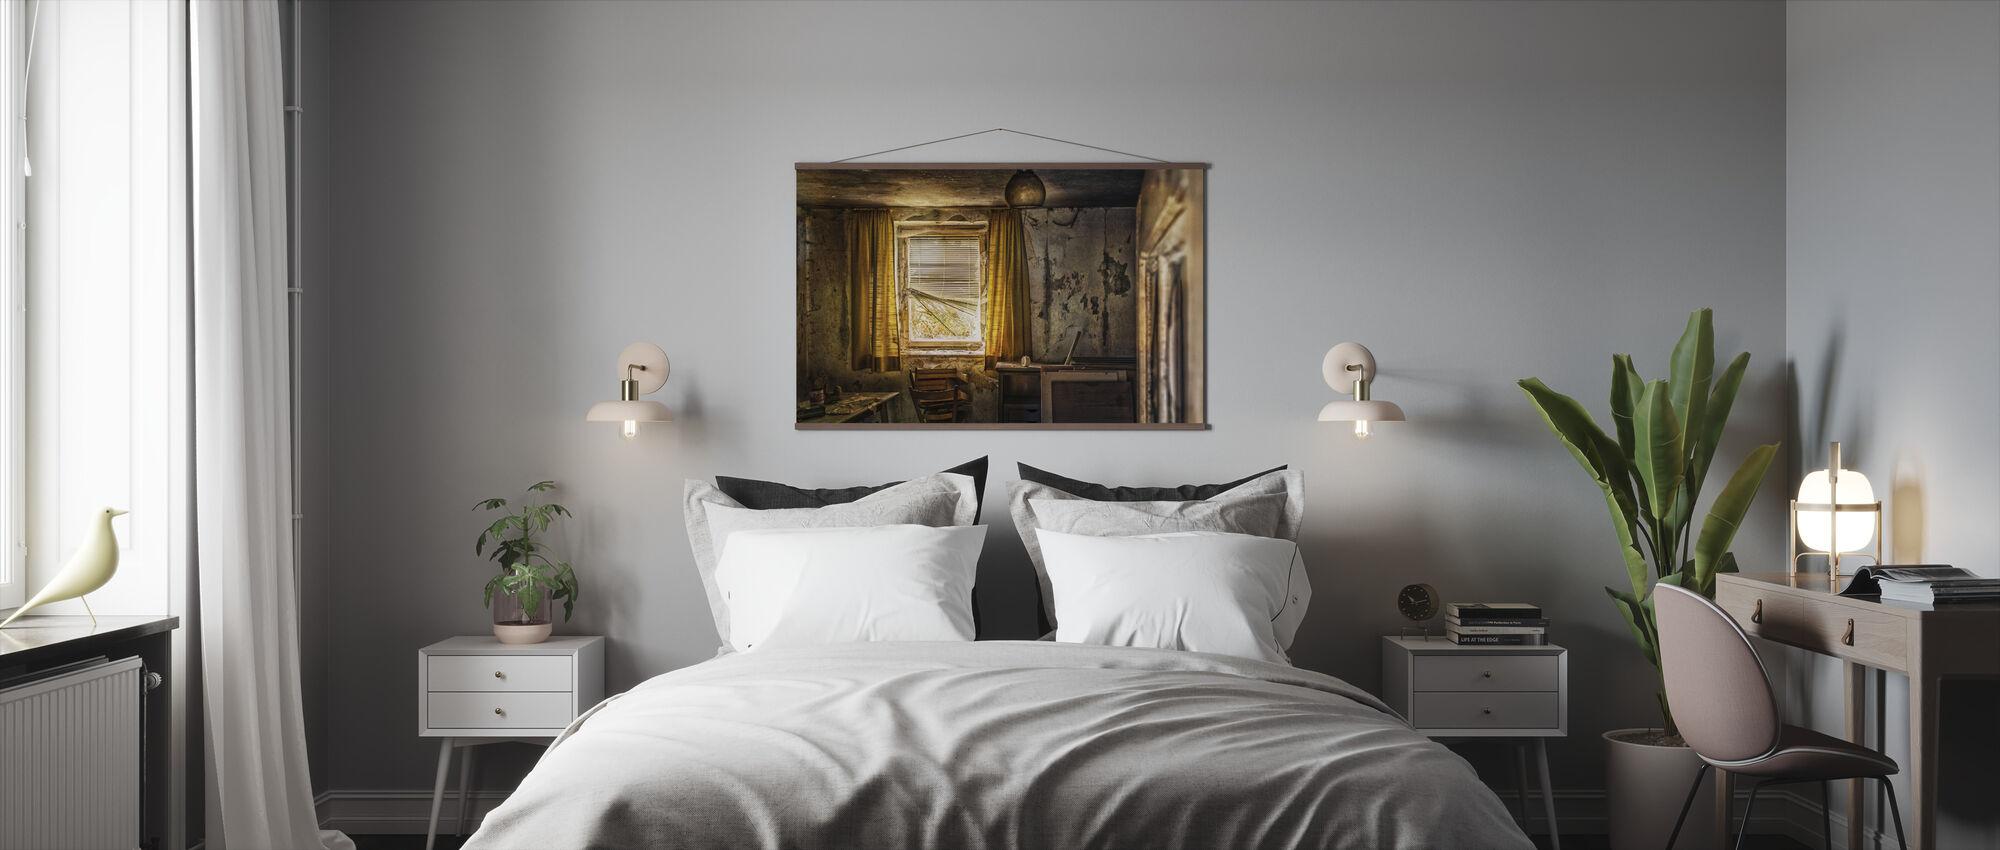 Abandoned Room - Poster - Bedroom